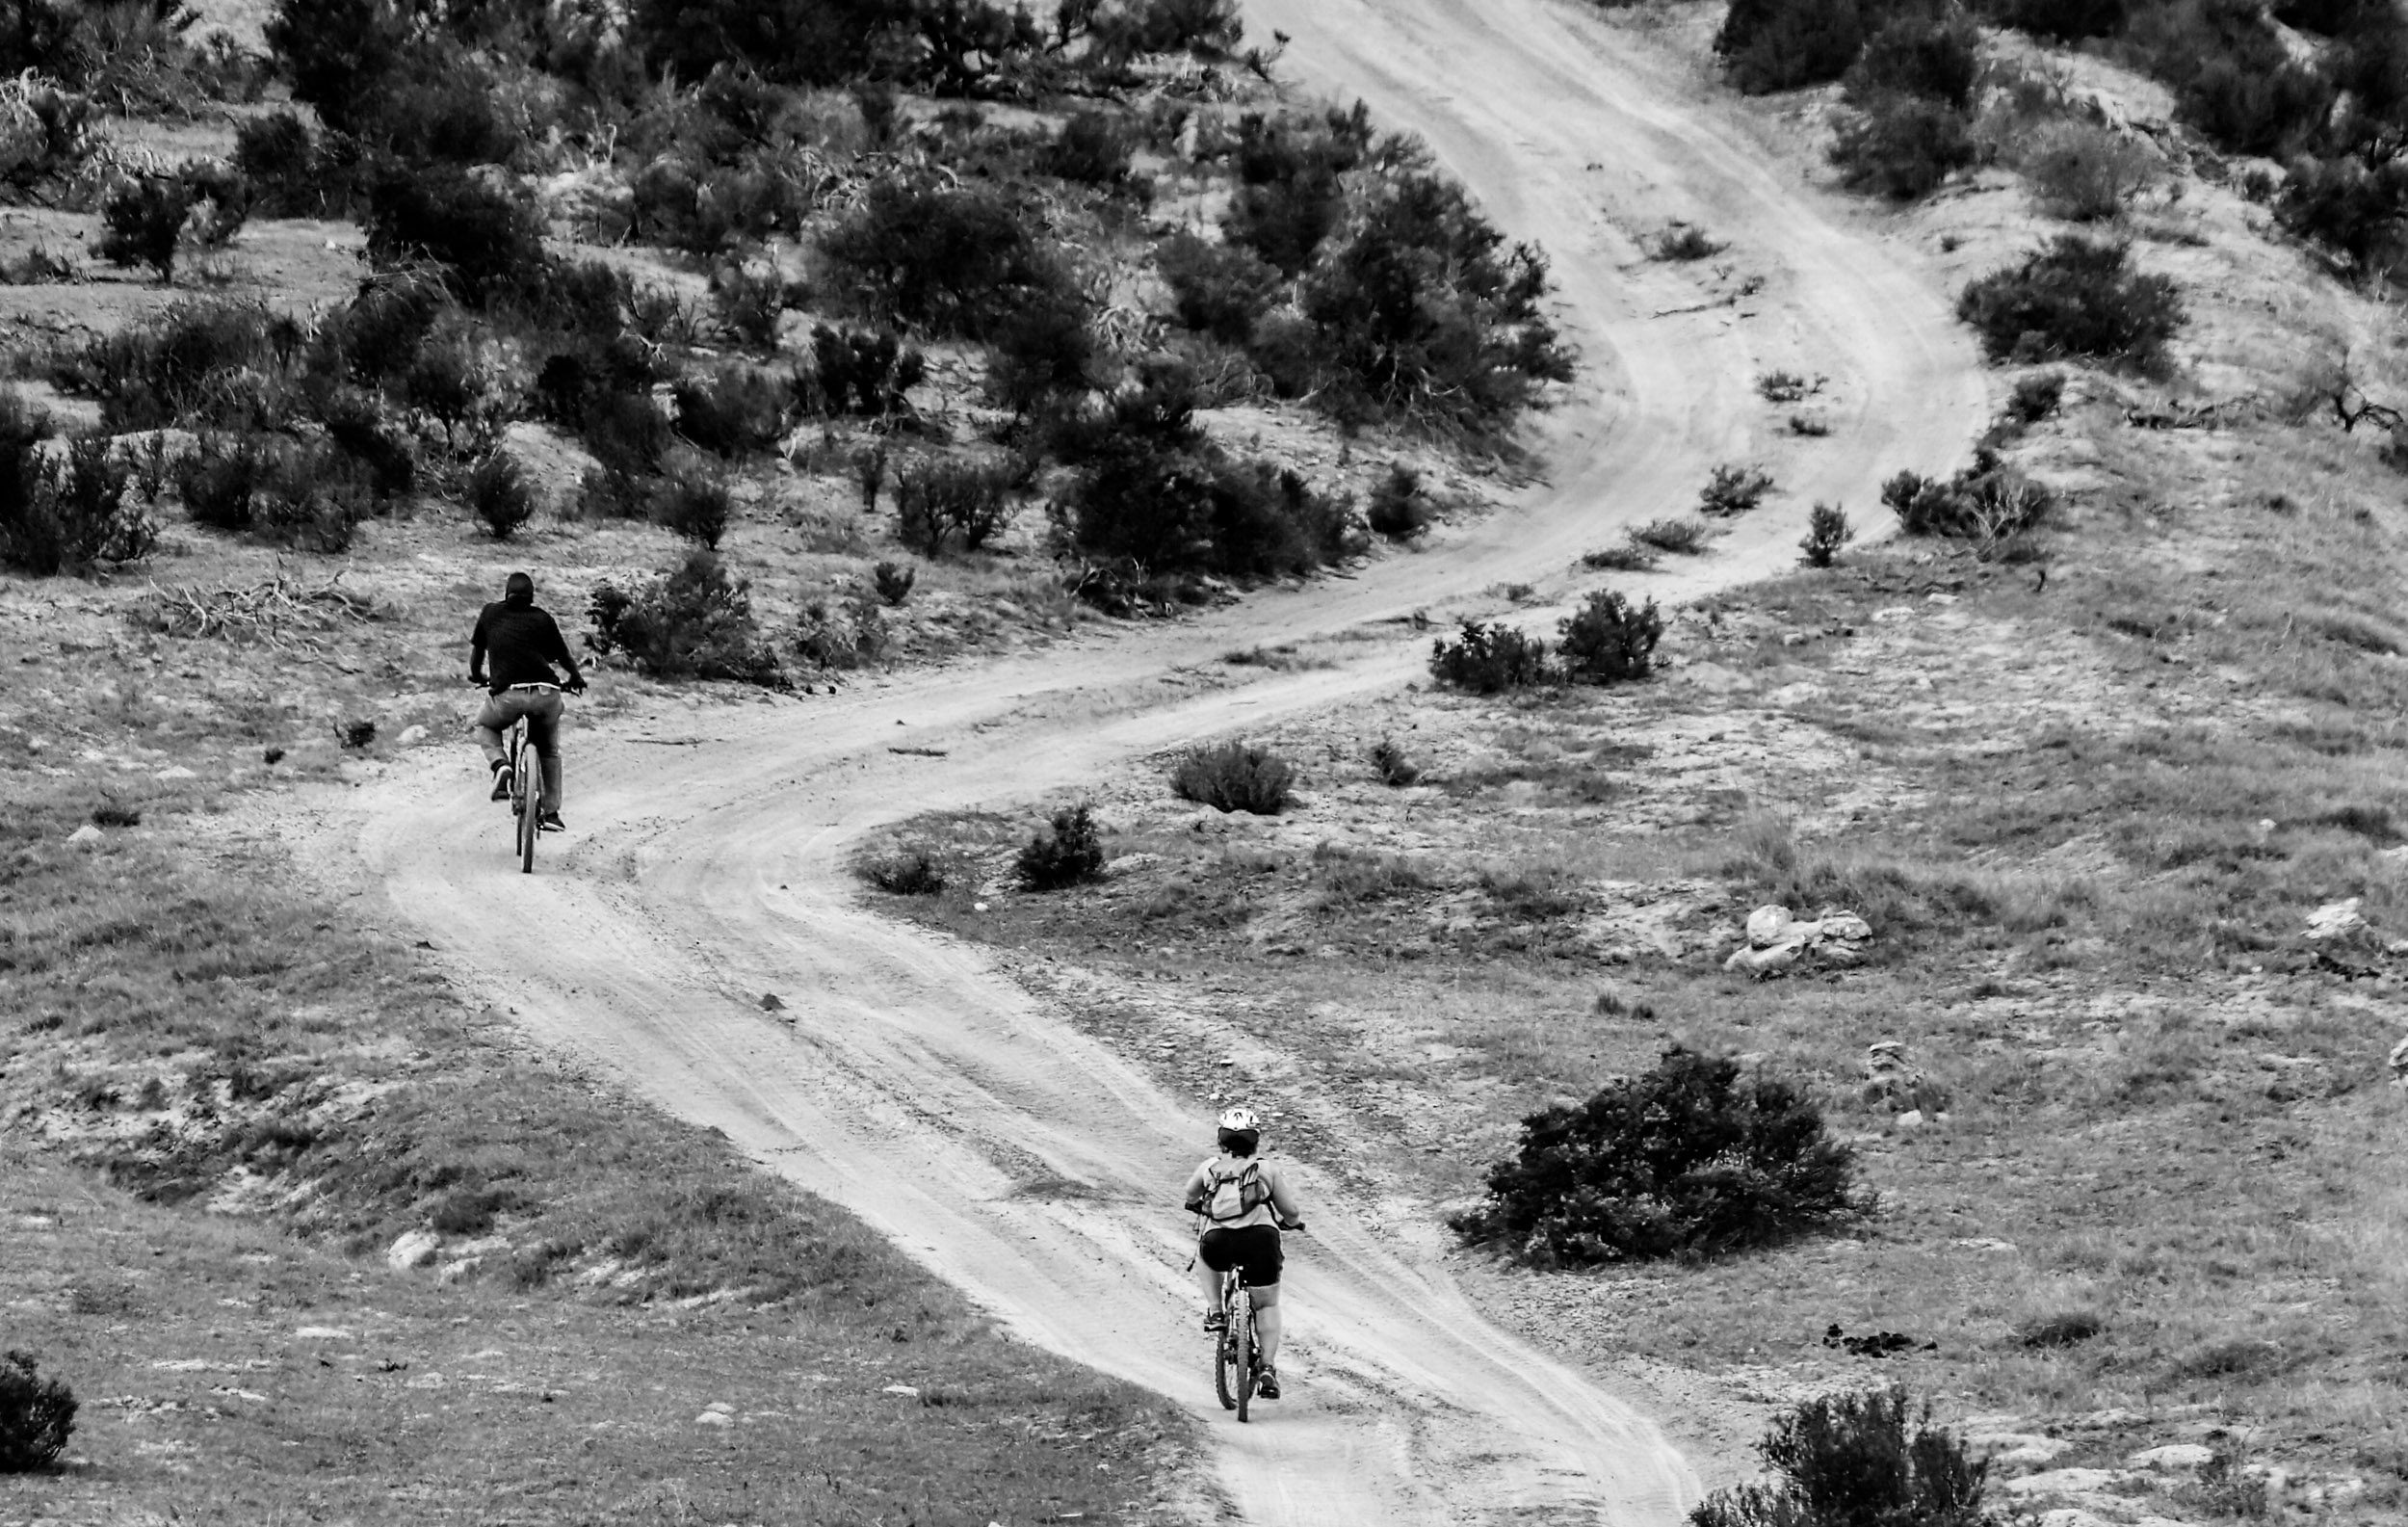 Bike and Saddle - 14 March 2018 (San Tour & West Coast National Park) - by Ken Treloar Photography (58)-2.JPG